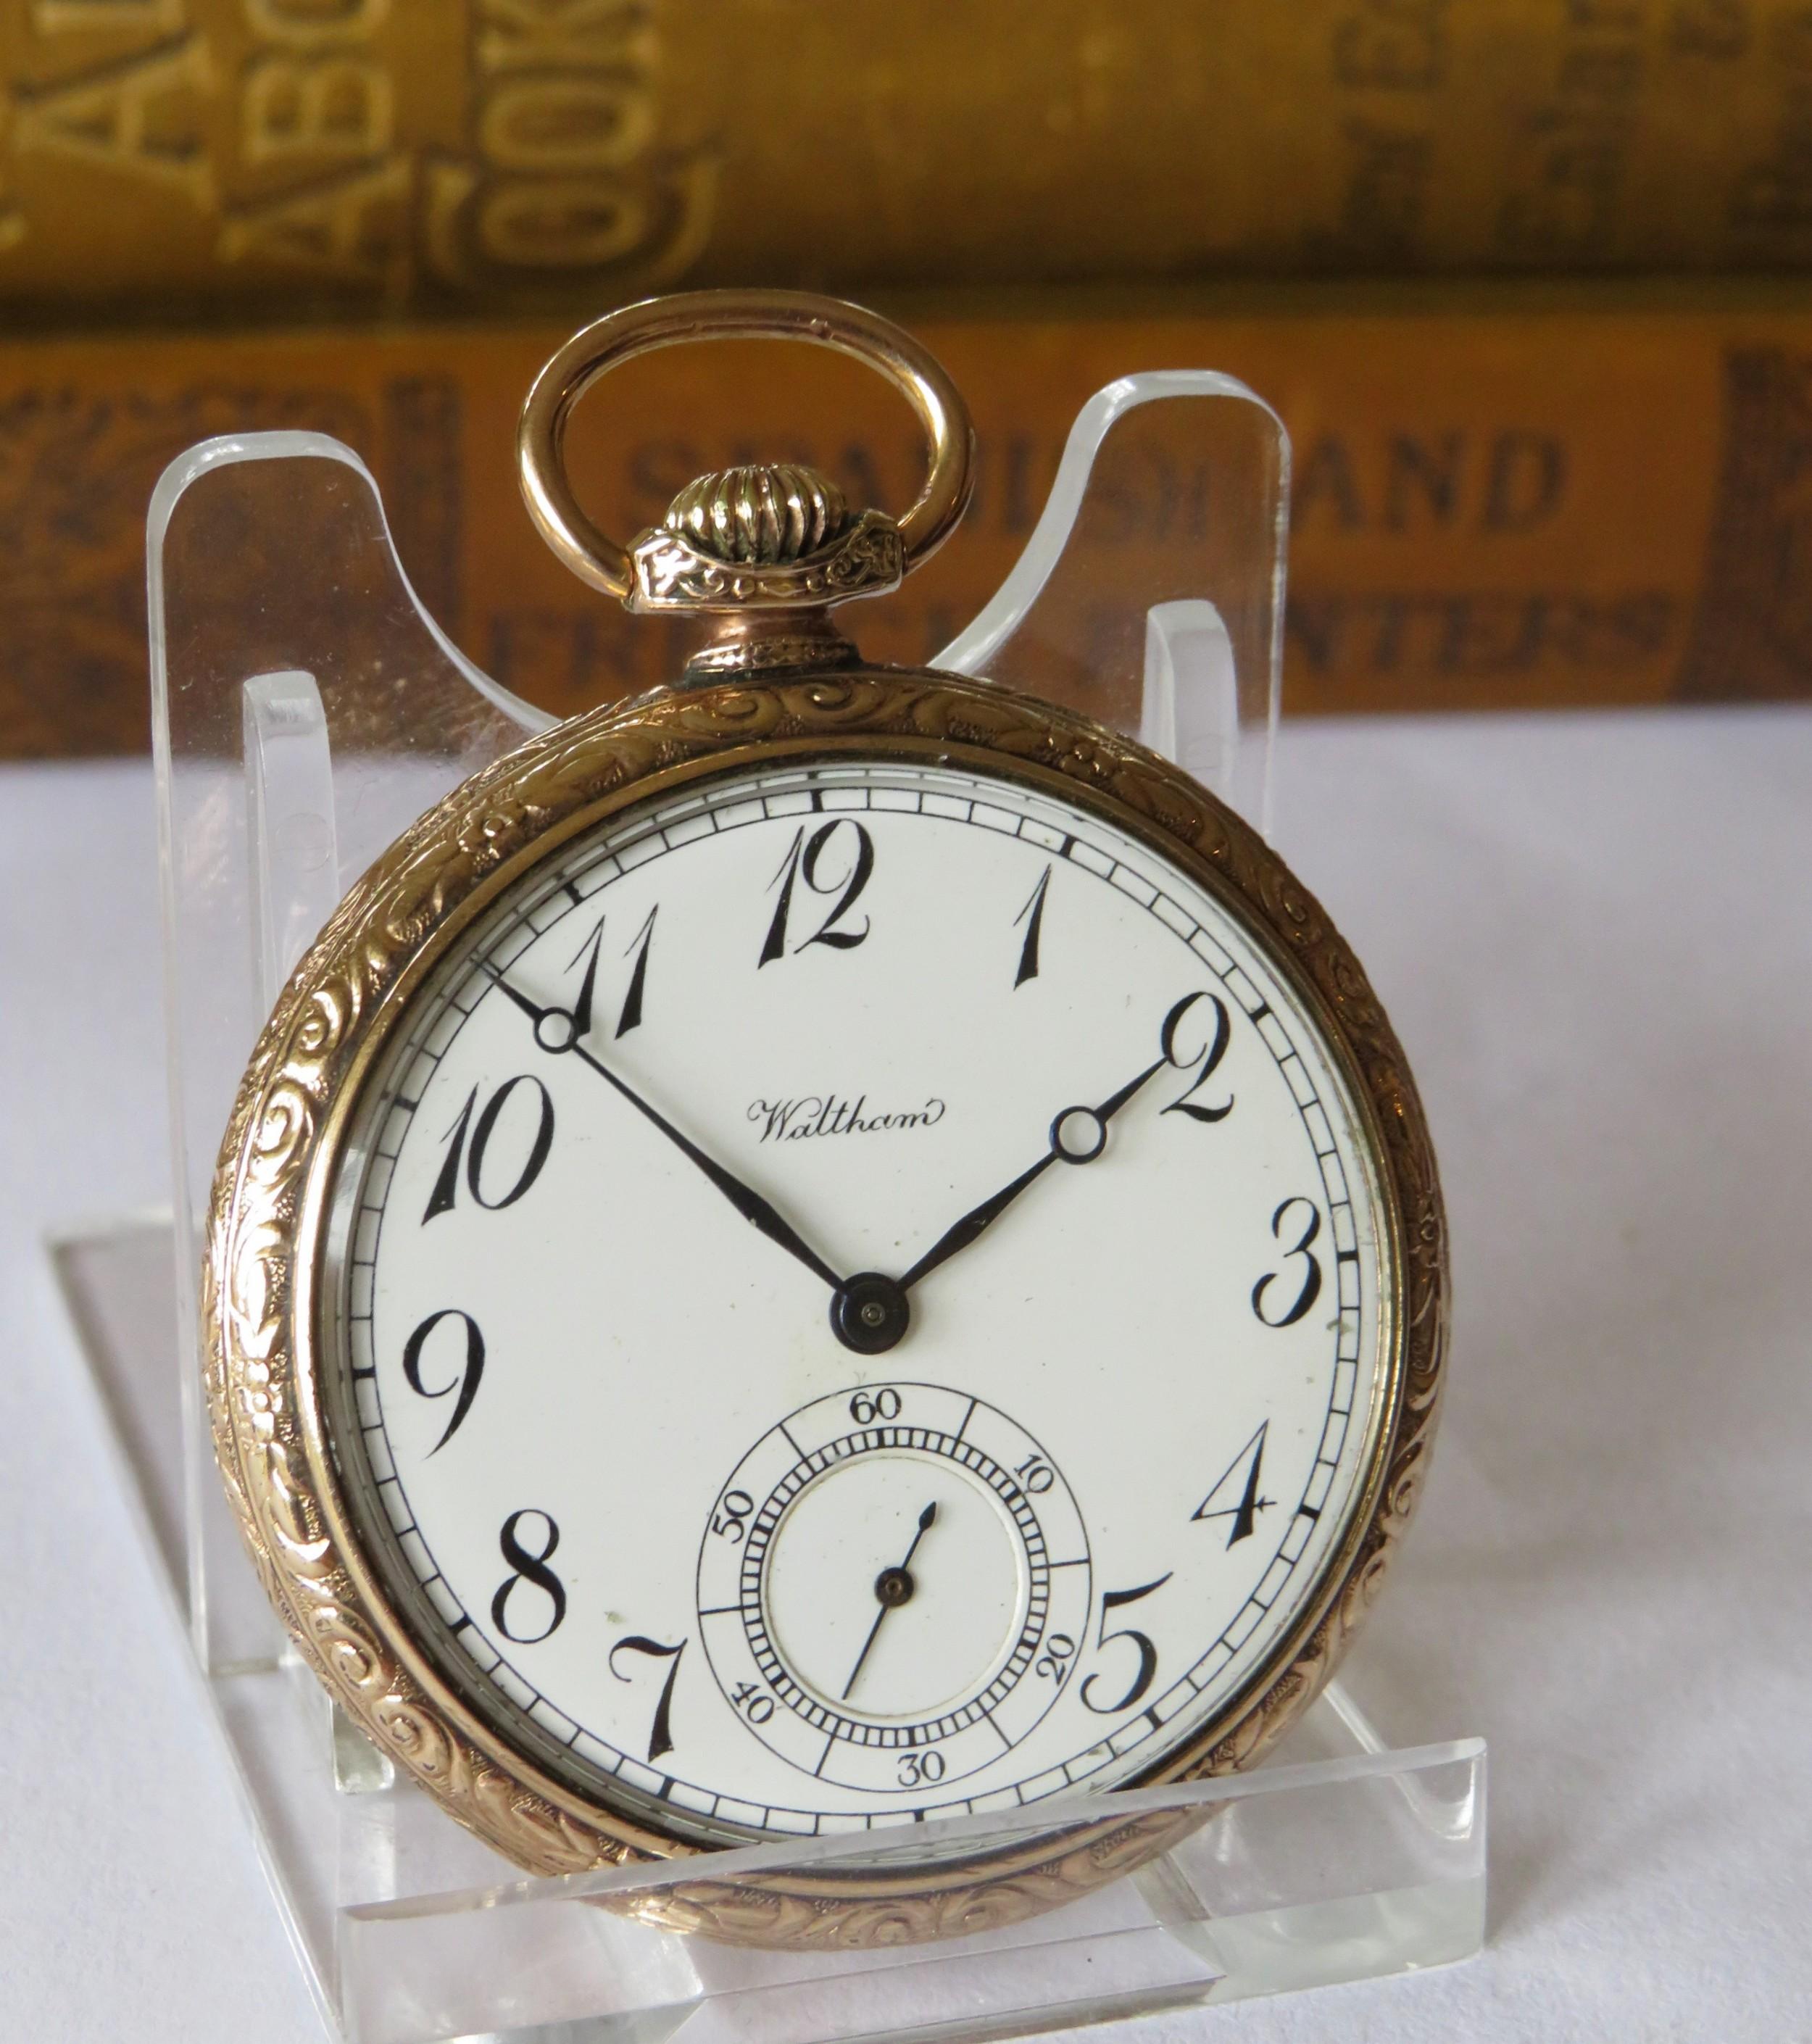 A 1920s Waltham Pocket Watch.   613645   Sellingantiques.co.uk